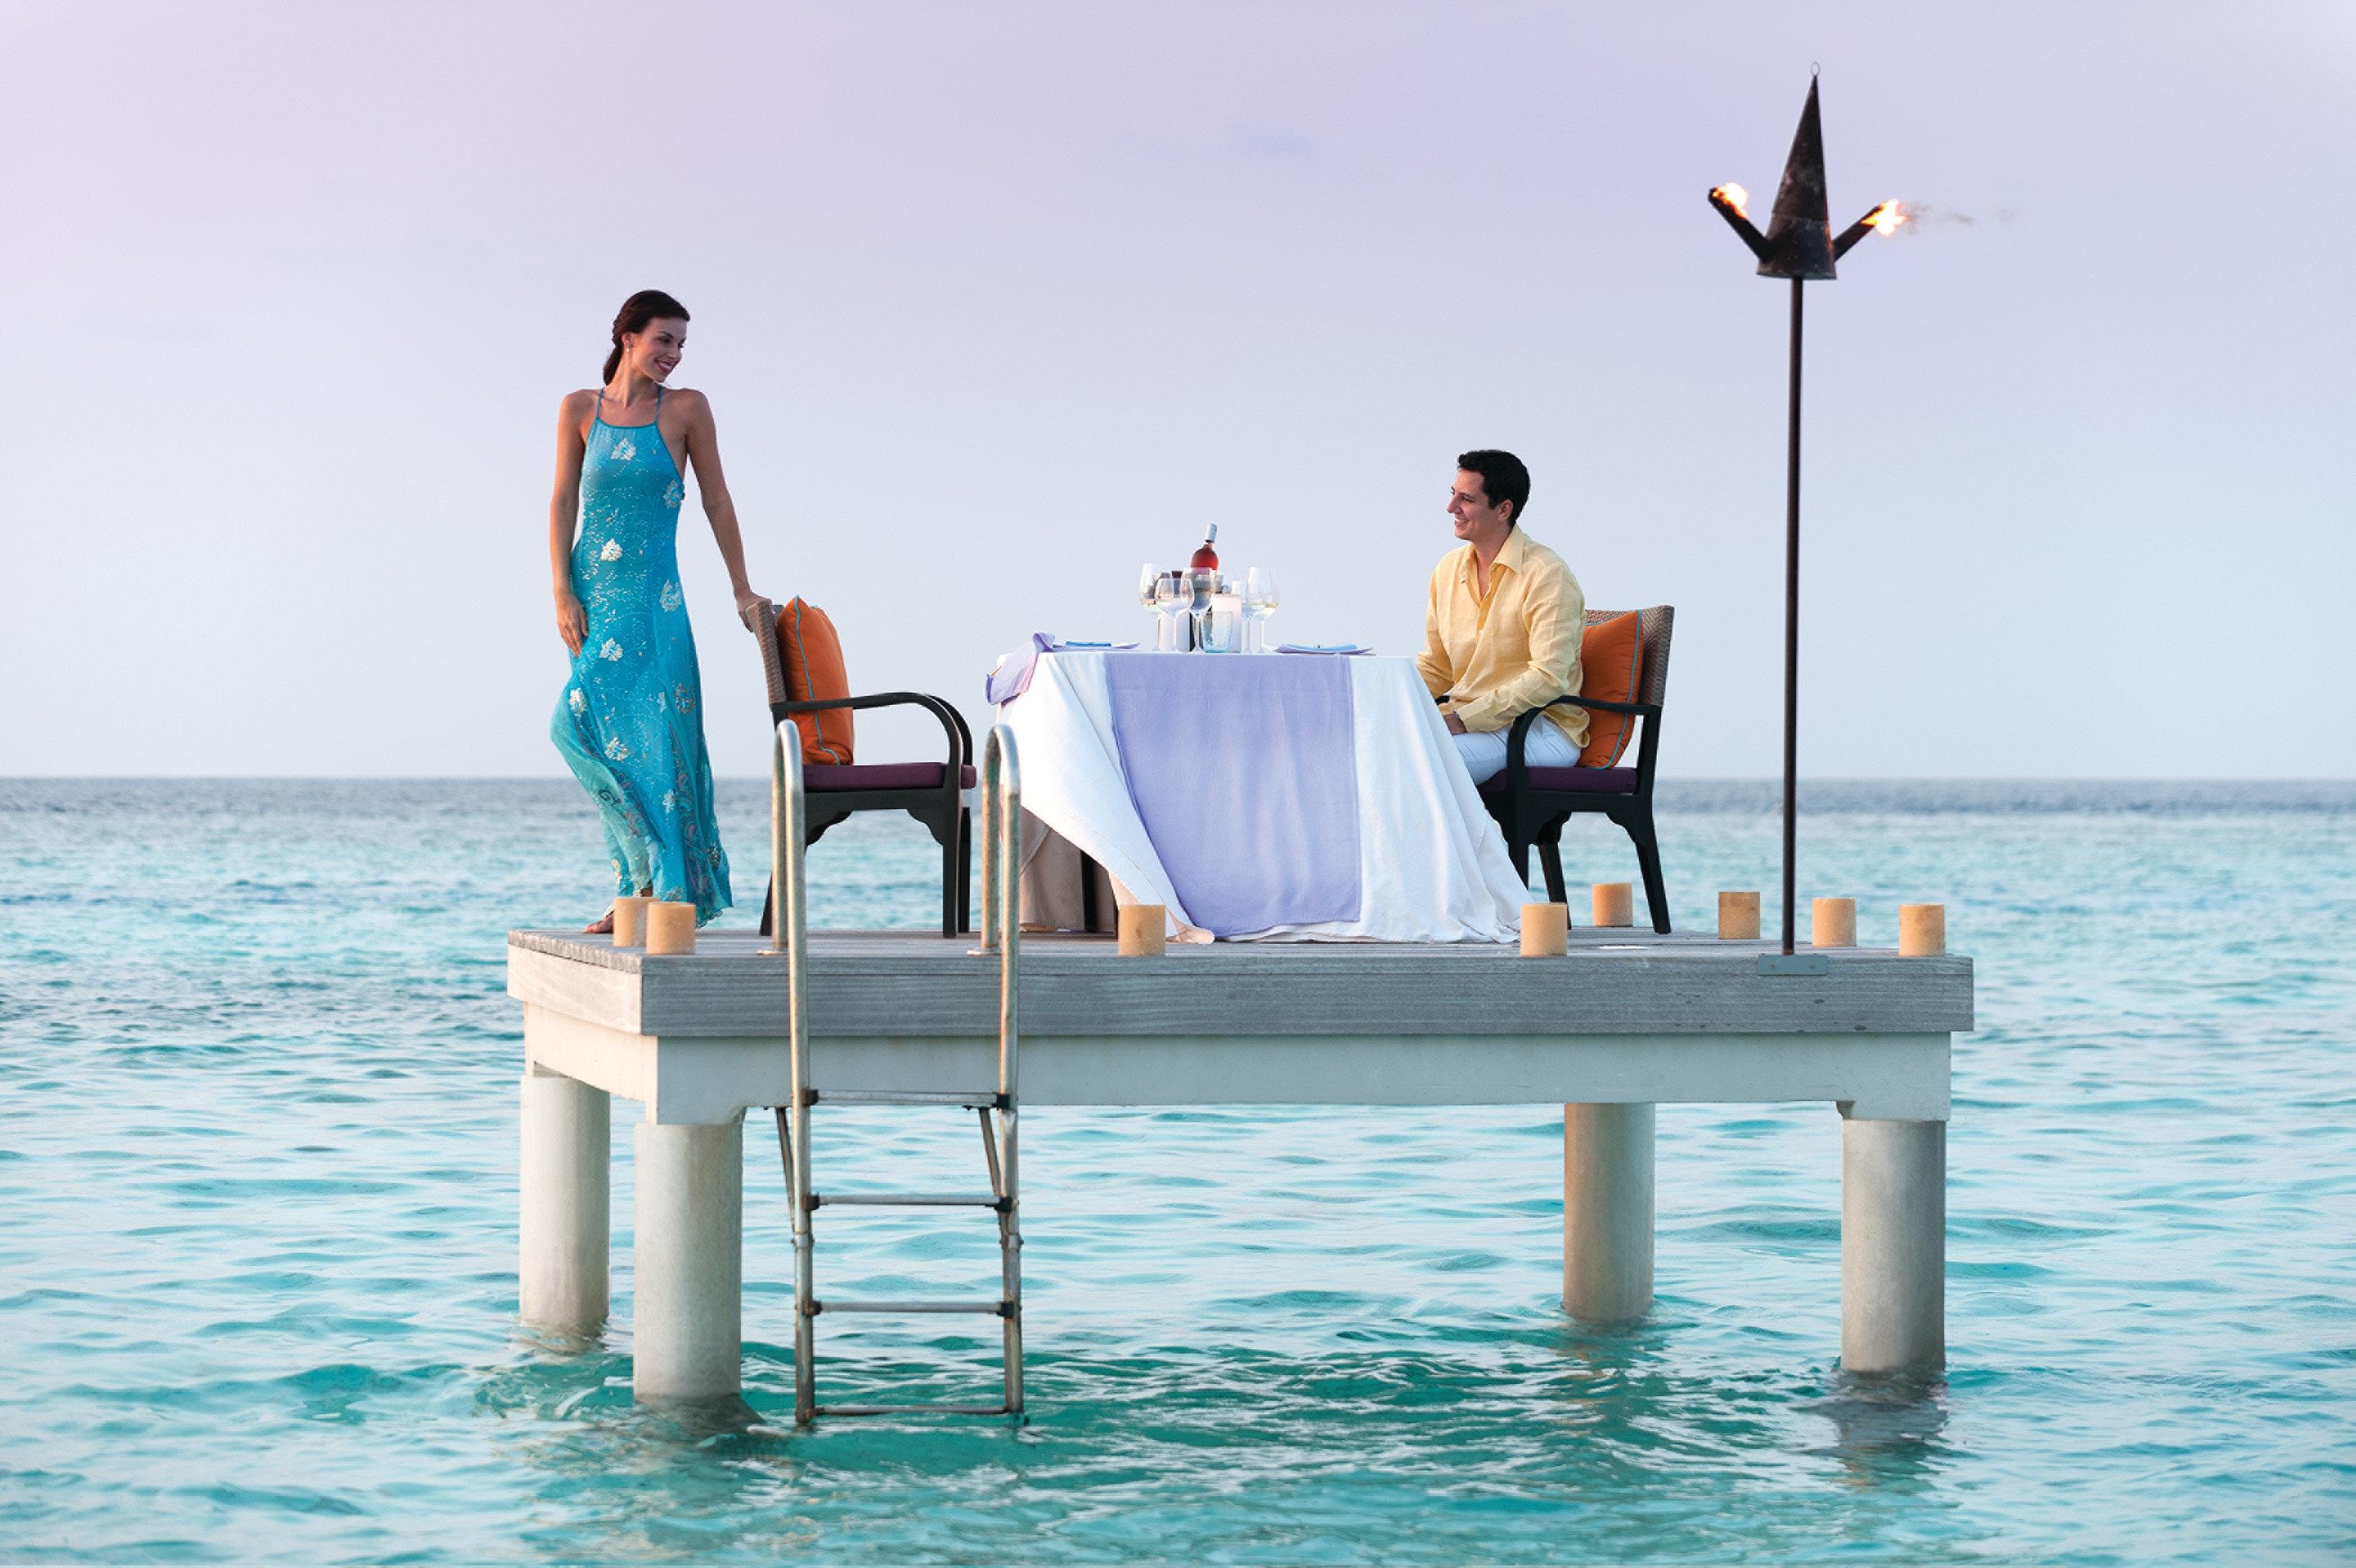 Trip Ideas water sky outdoor leisure vacation Sea Ocean Beach swimming pool caribbean bay